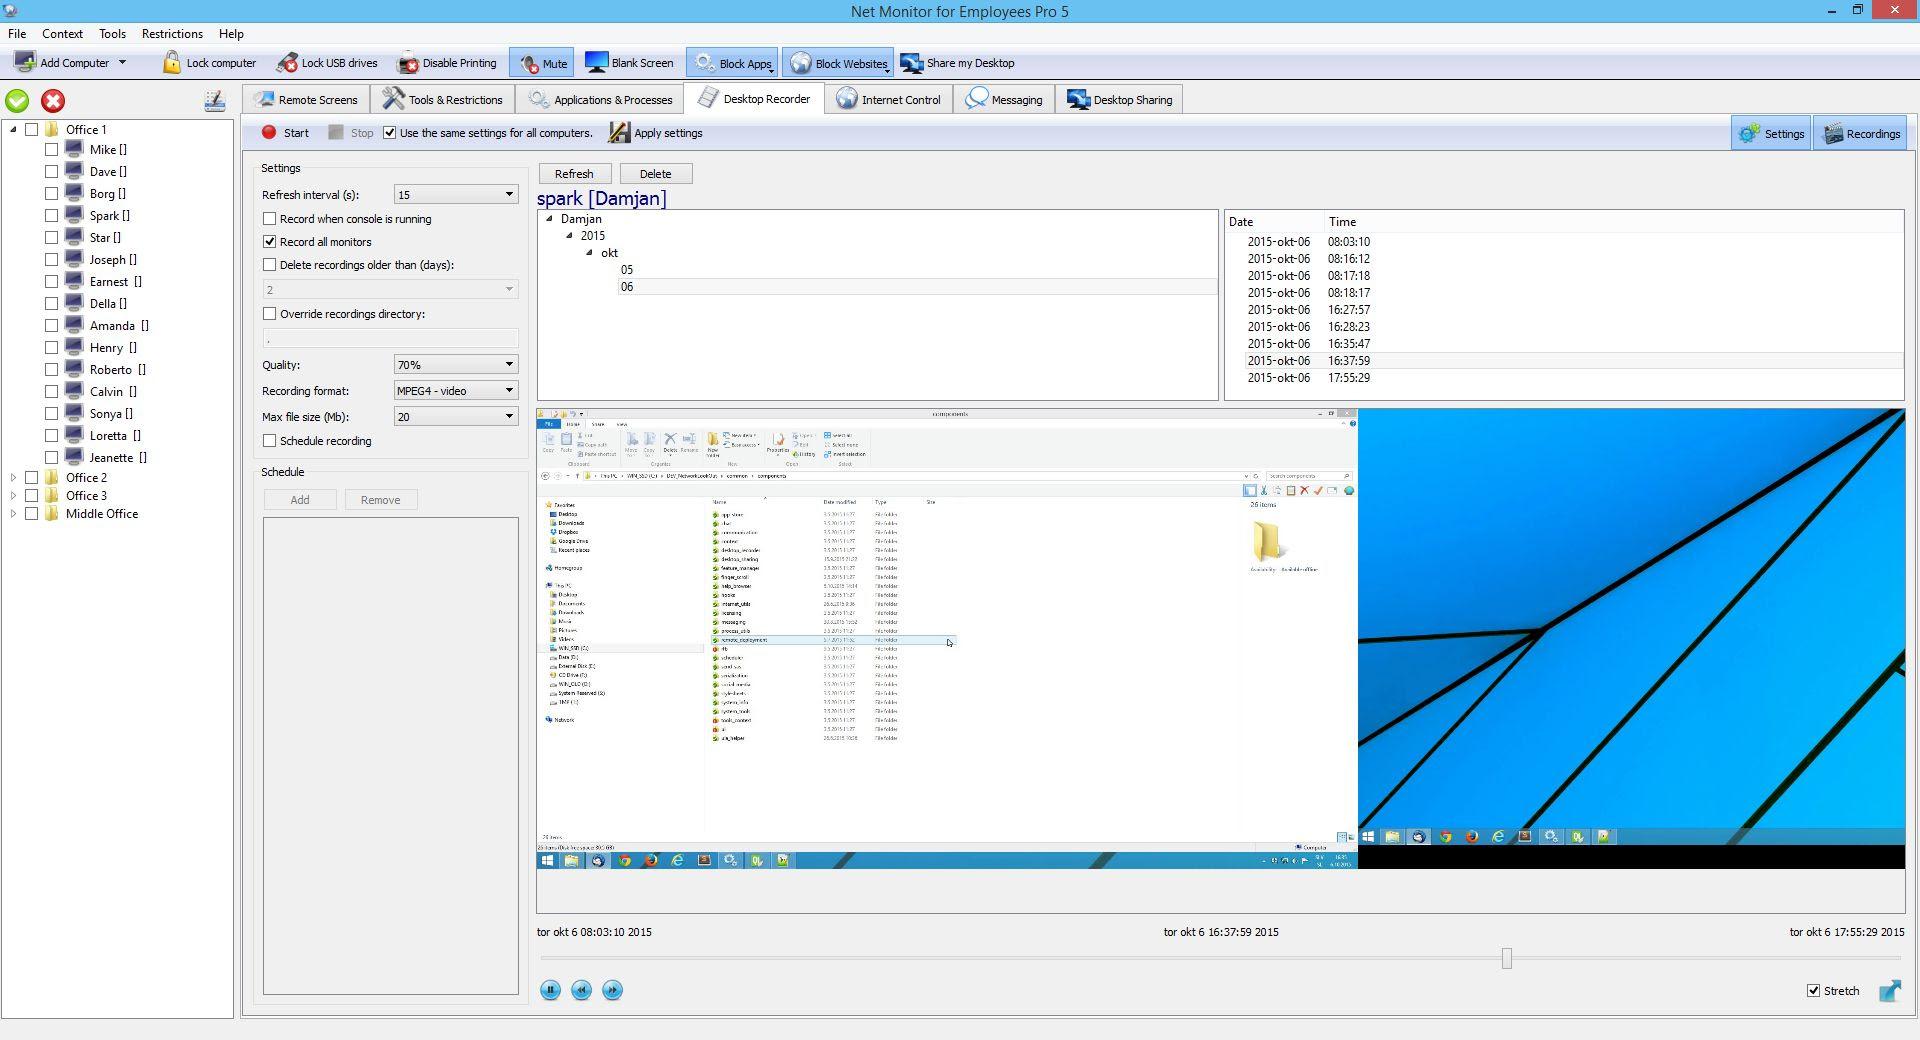 http://networklookout.com/screenshots/windows/win_desktop_recorder.jpg